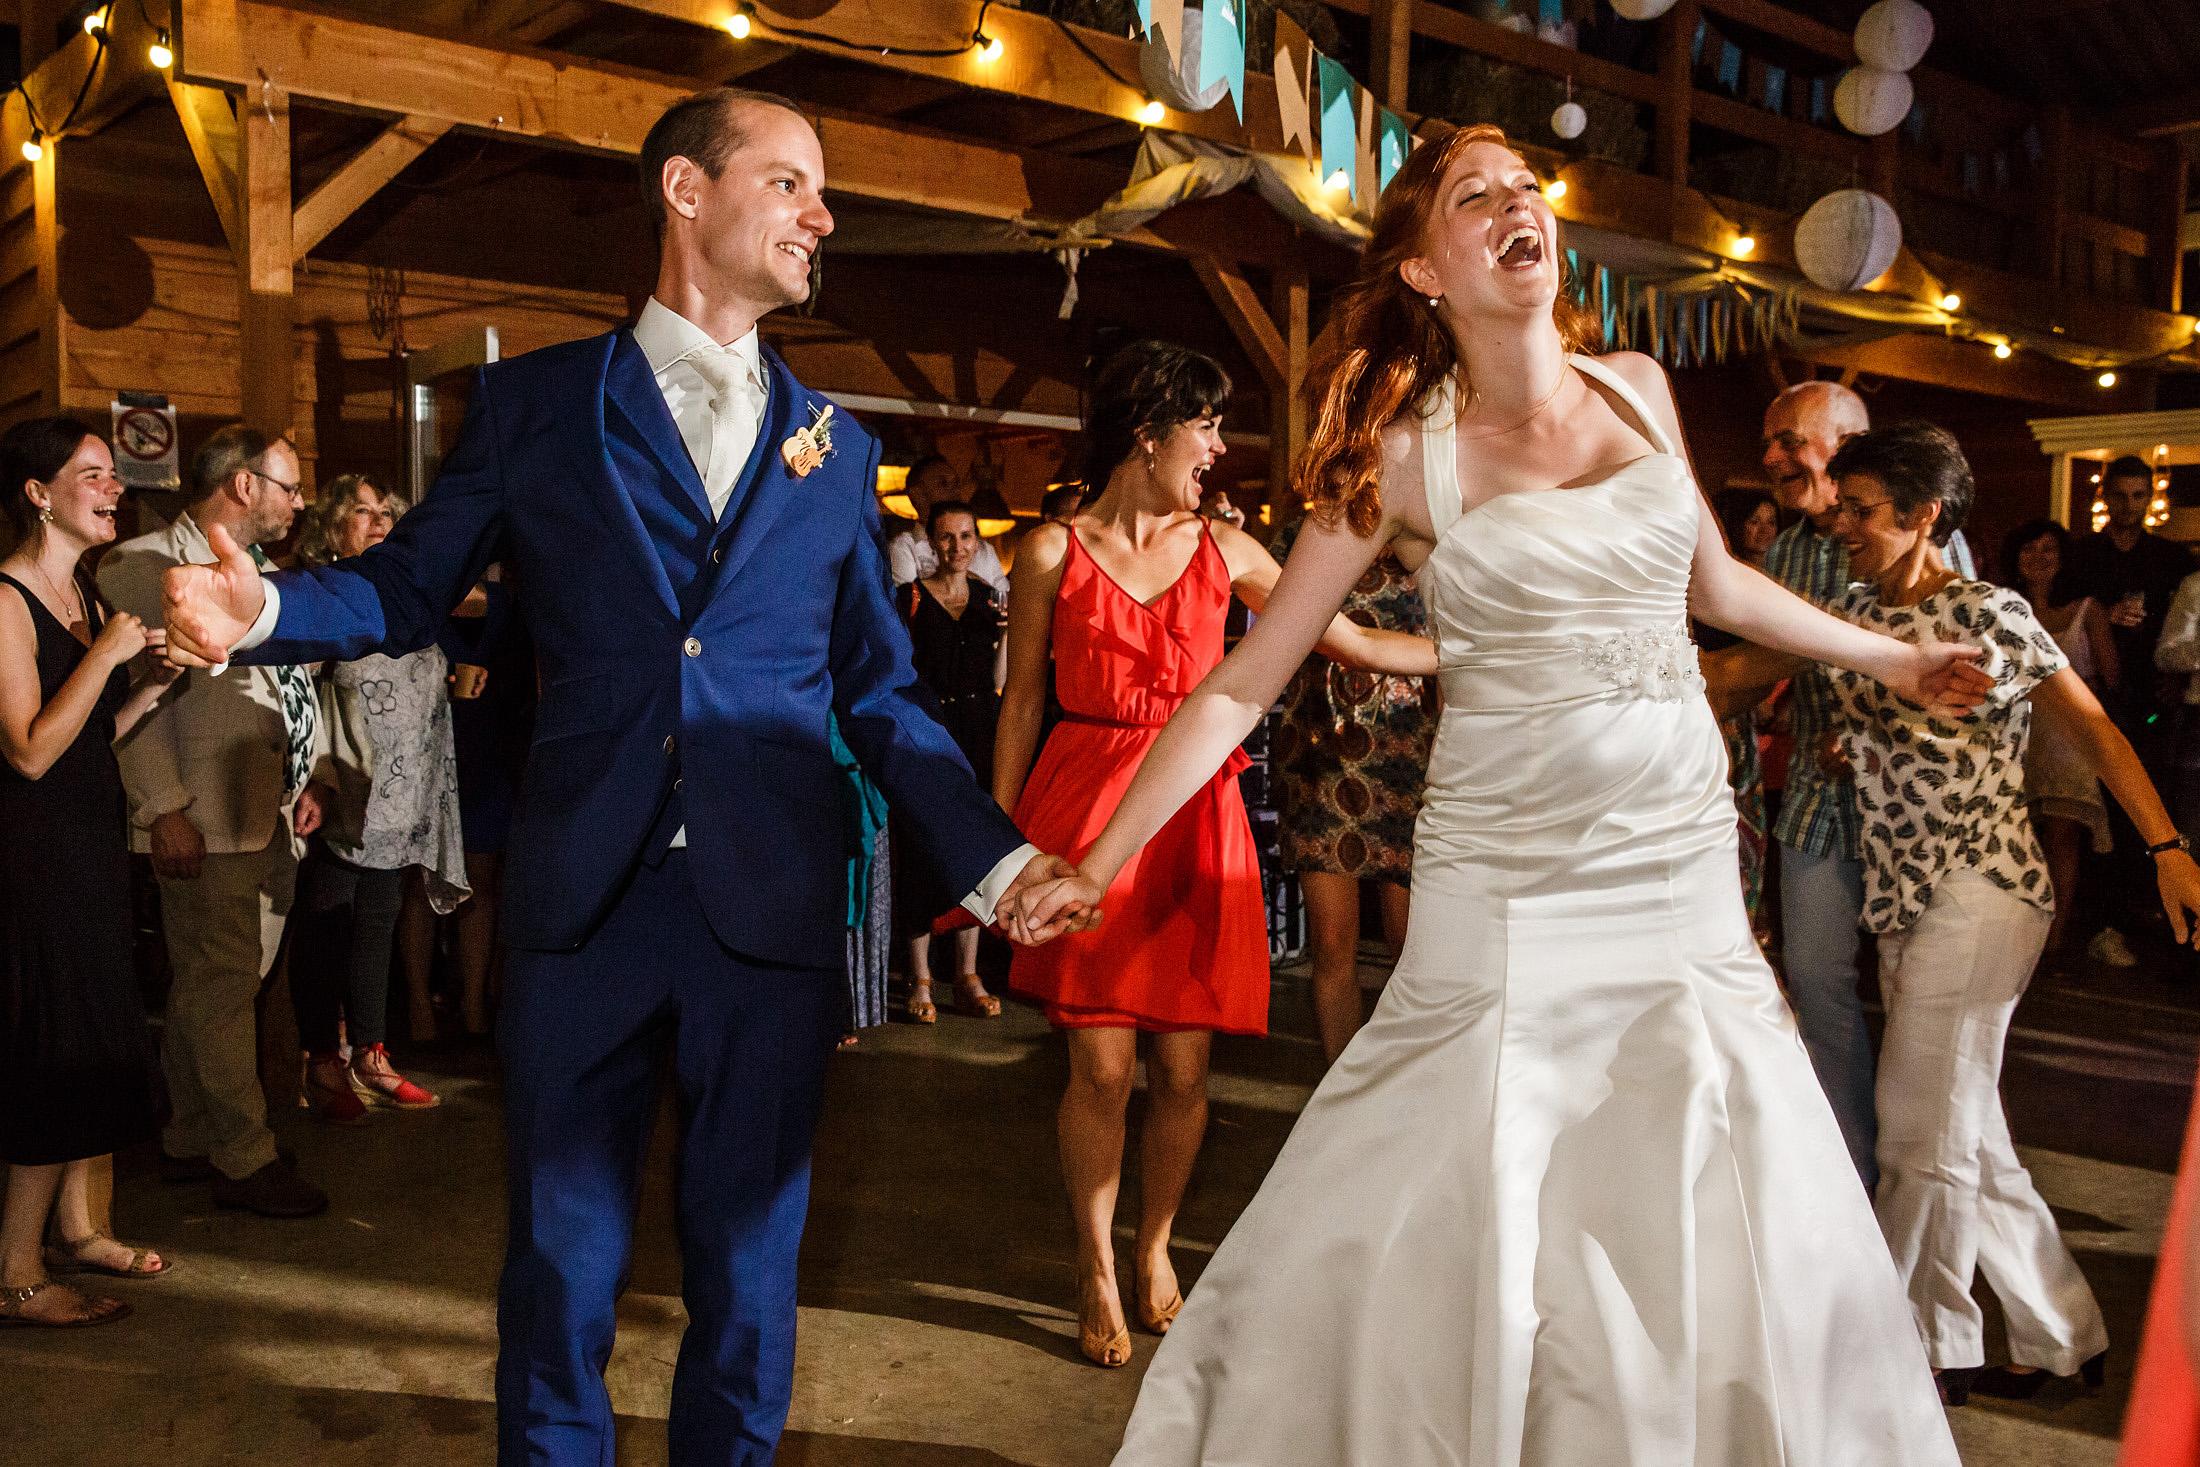 feest bruiloft boergondineren